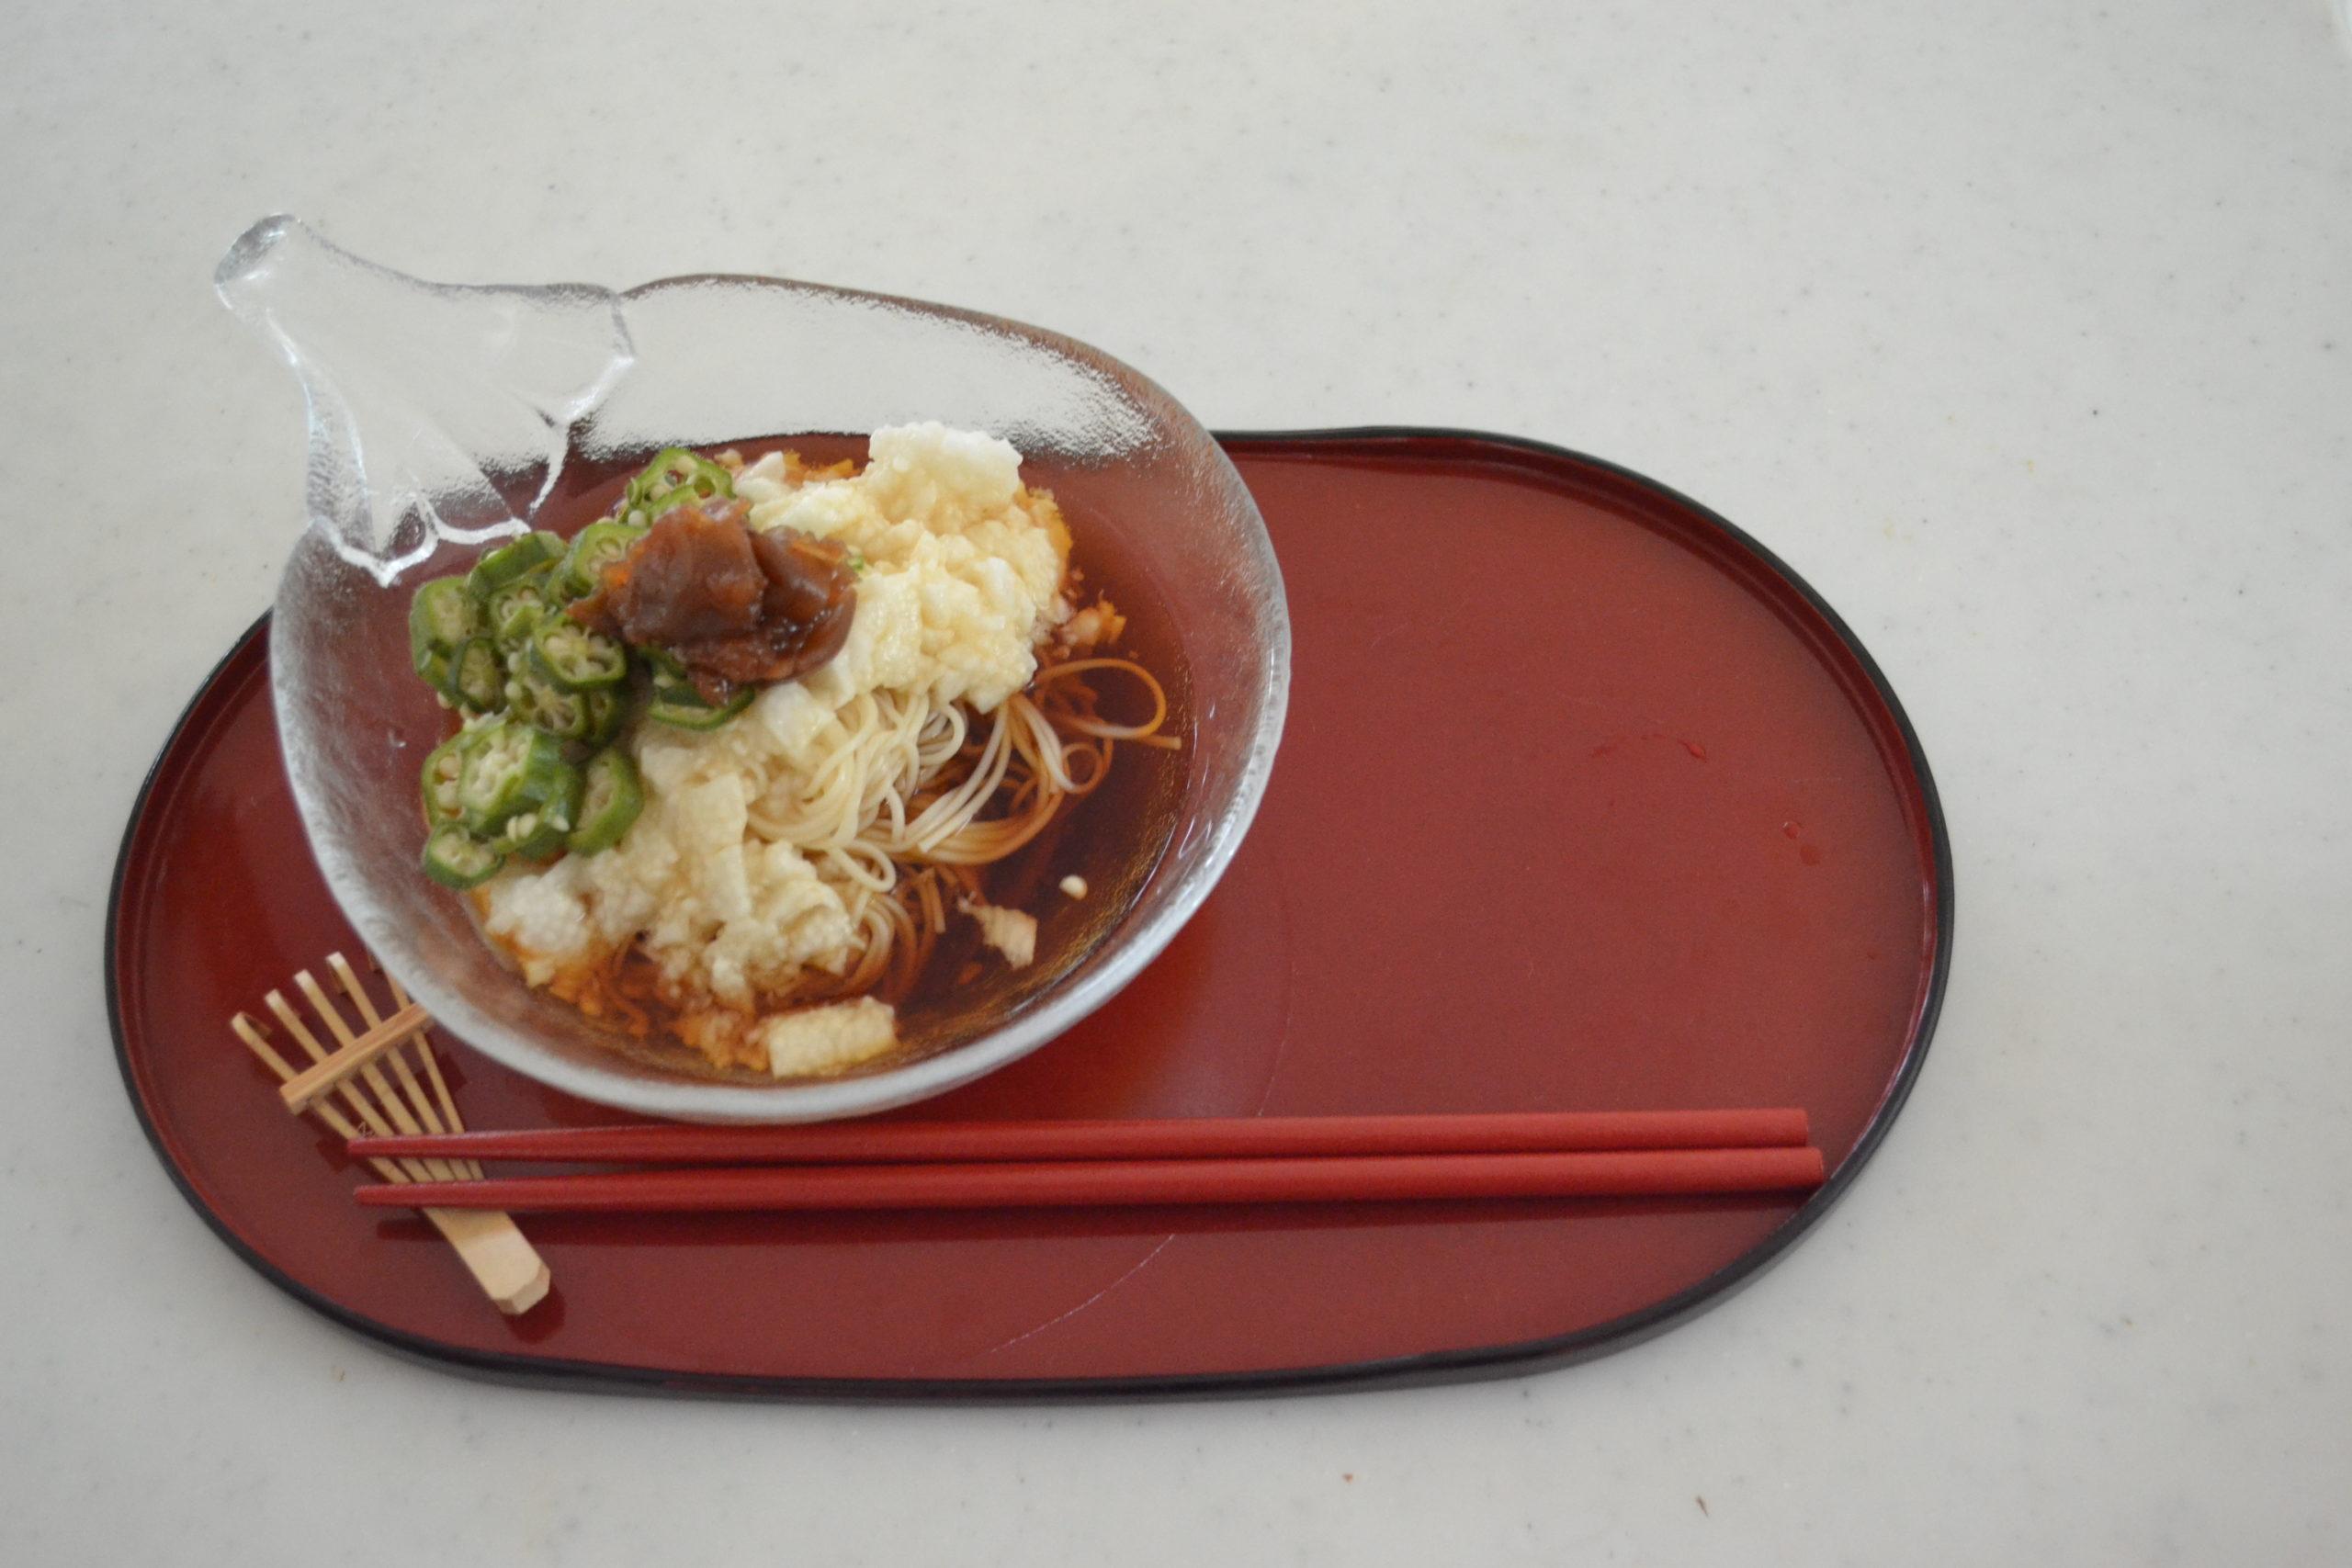 Sticky Summer Somen noodles   Nagaimo and Okura Somen Noodles